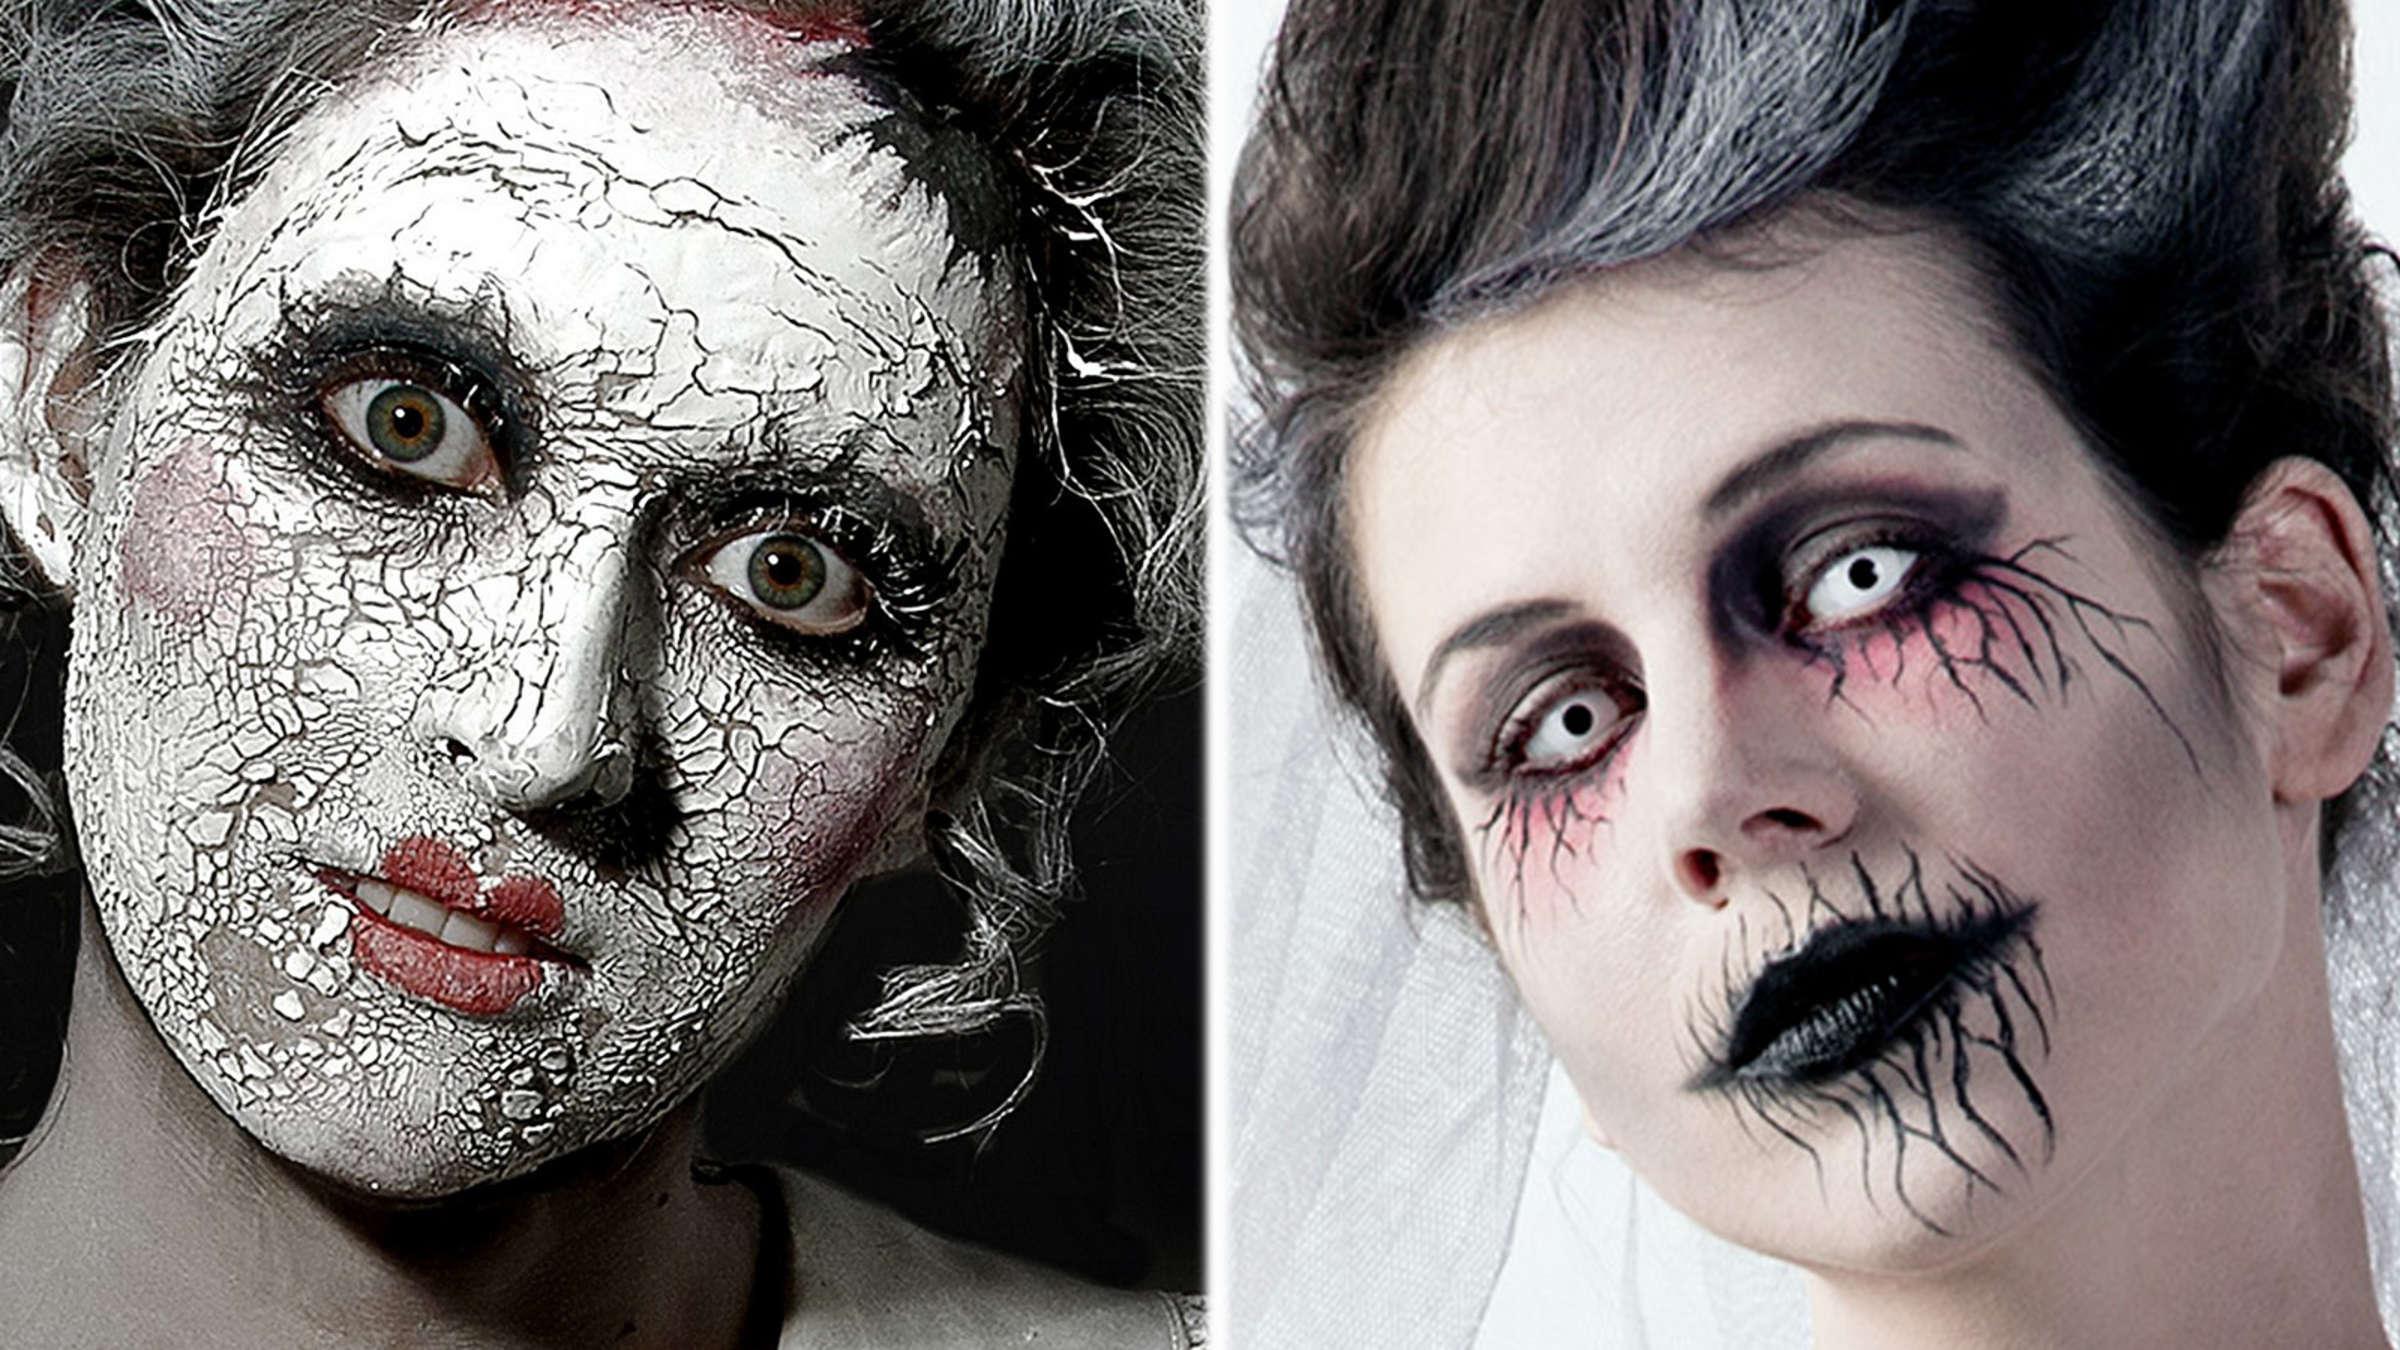 Perfekte Schminke Zu Halloween 2017 Maskenbildnerin Gibt Tipps Zu